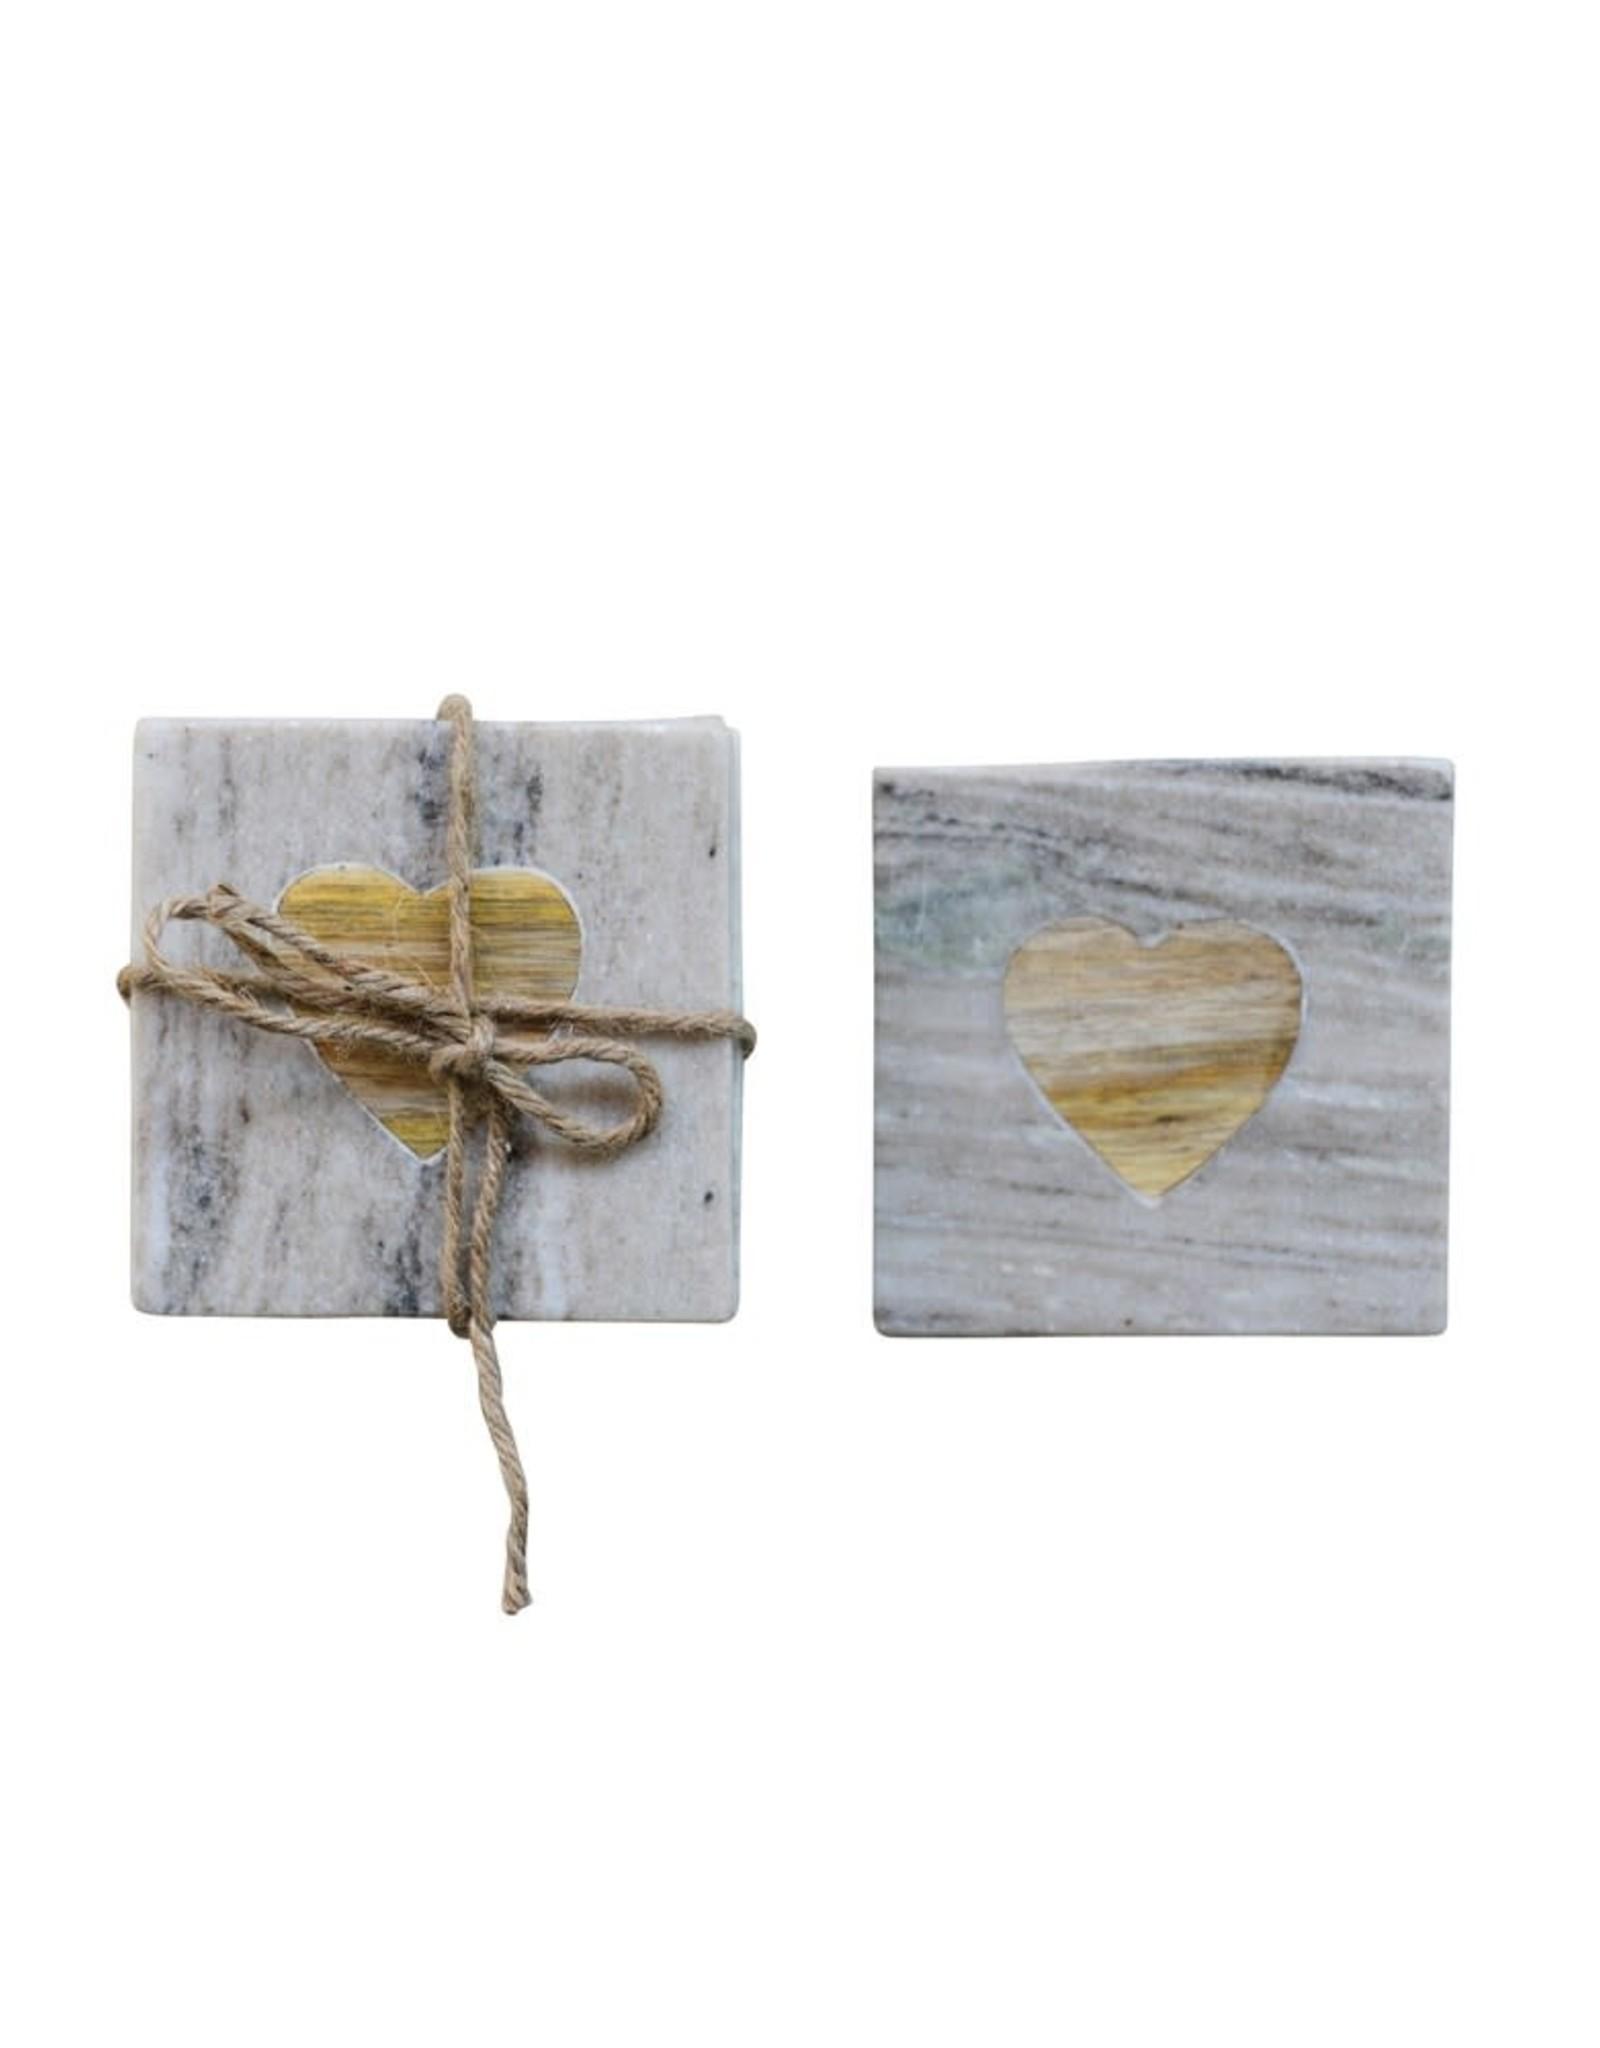 Wink Marble and Acacia Heart Coaster Set